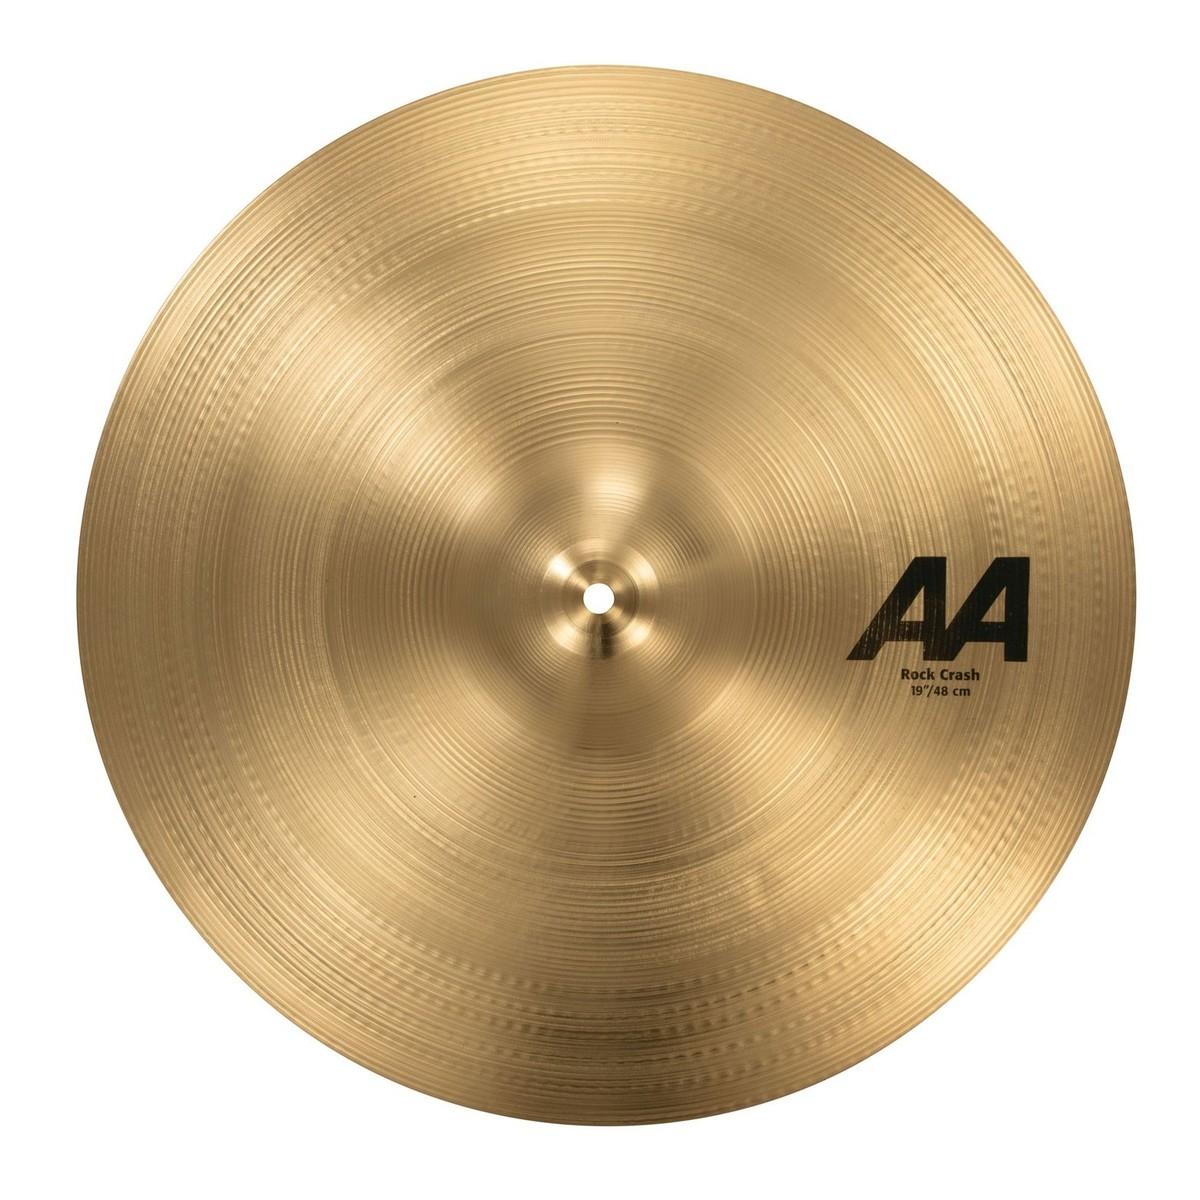 sabian aa 19 39 39 rock crash cymbal at gear4music. Black Bedroom Furniture Sets. Home Design Ideas